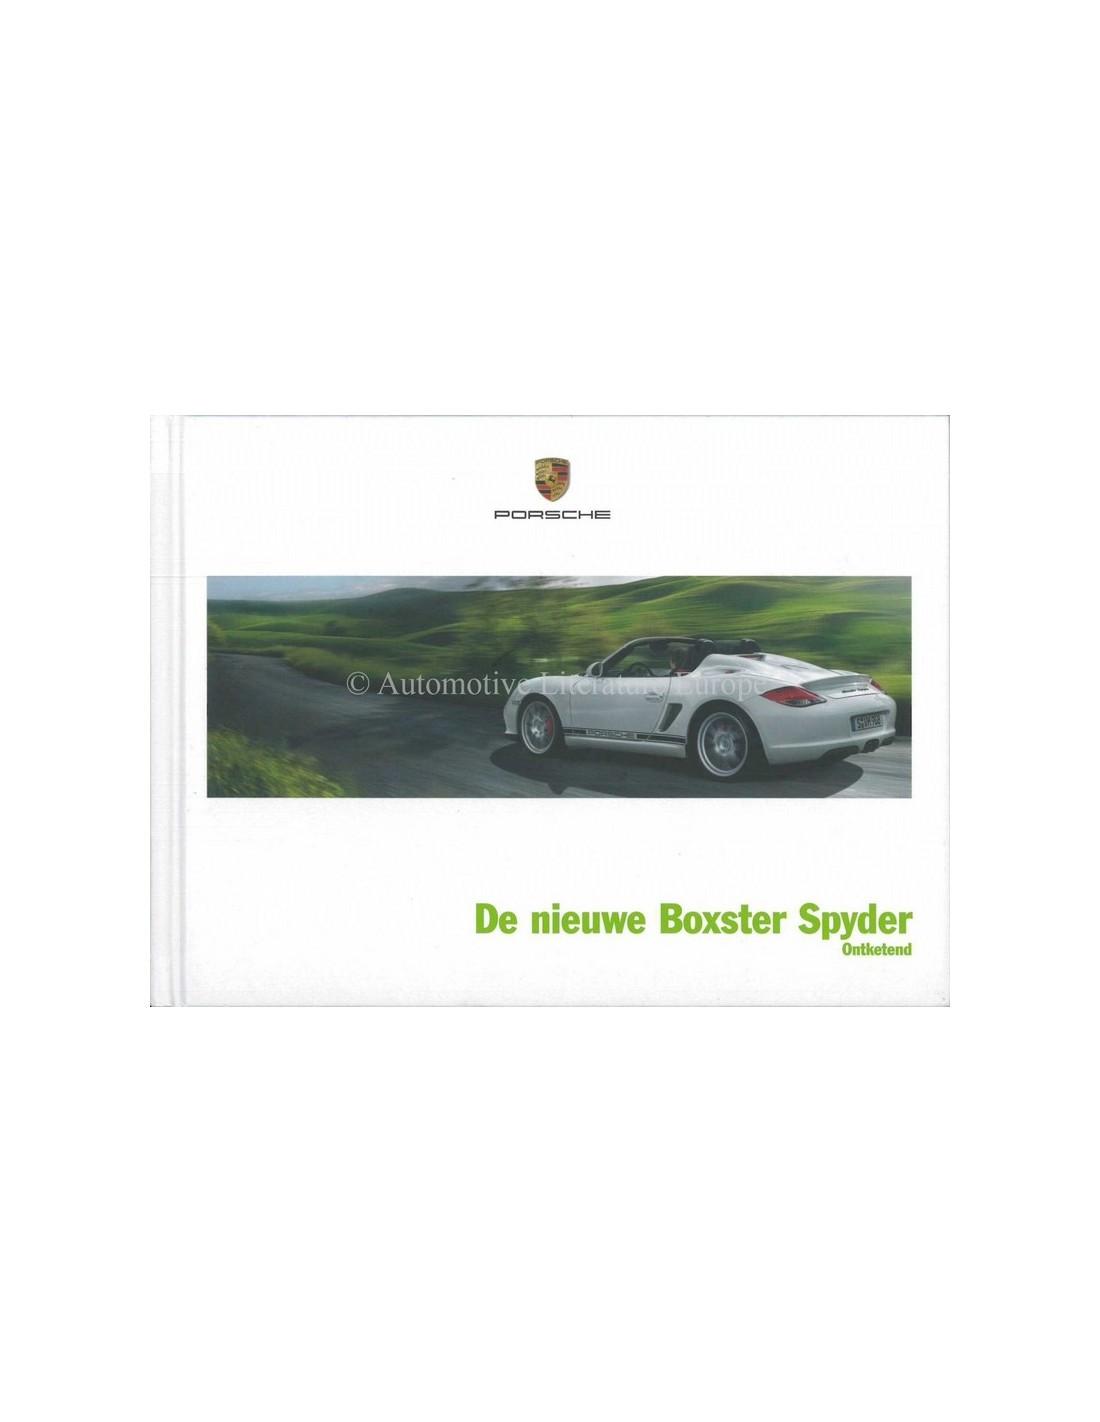 Bmw Z3 Brochure: 2010 PORSCHE BOXSTER SPYDER HARDCOVER BROCHURE DUTCH